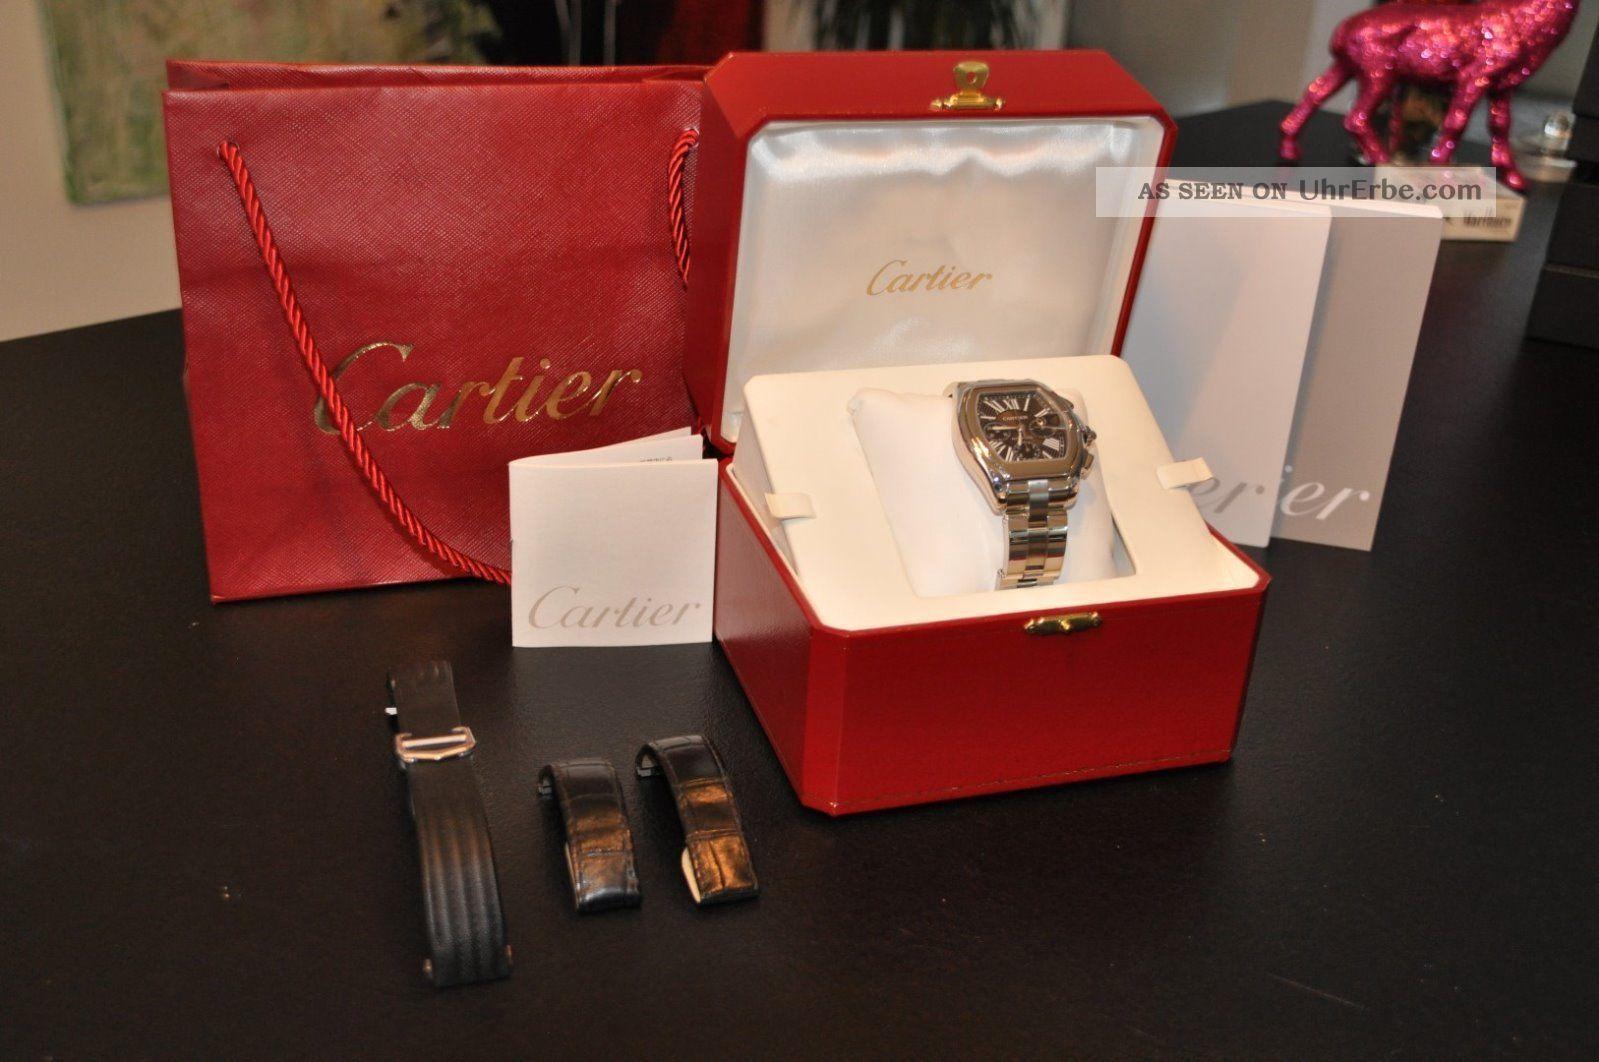 Cartier Roadster Xl Schwarz Wie - Mit 3 Armbändern Armbanduhren Bild